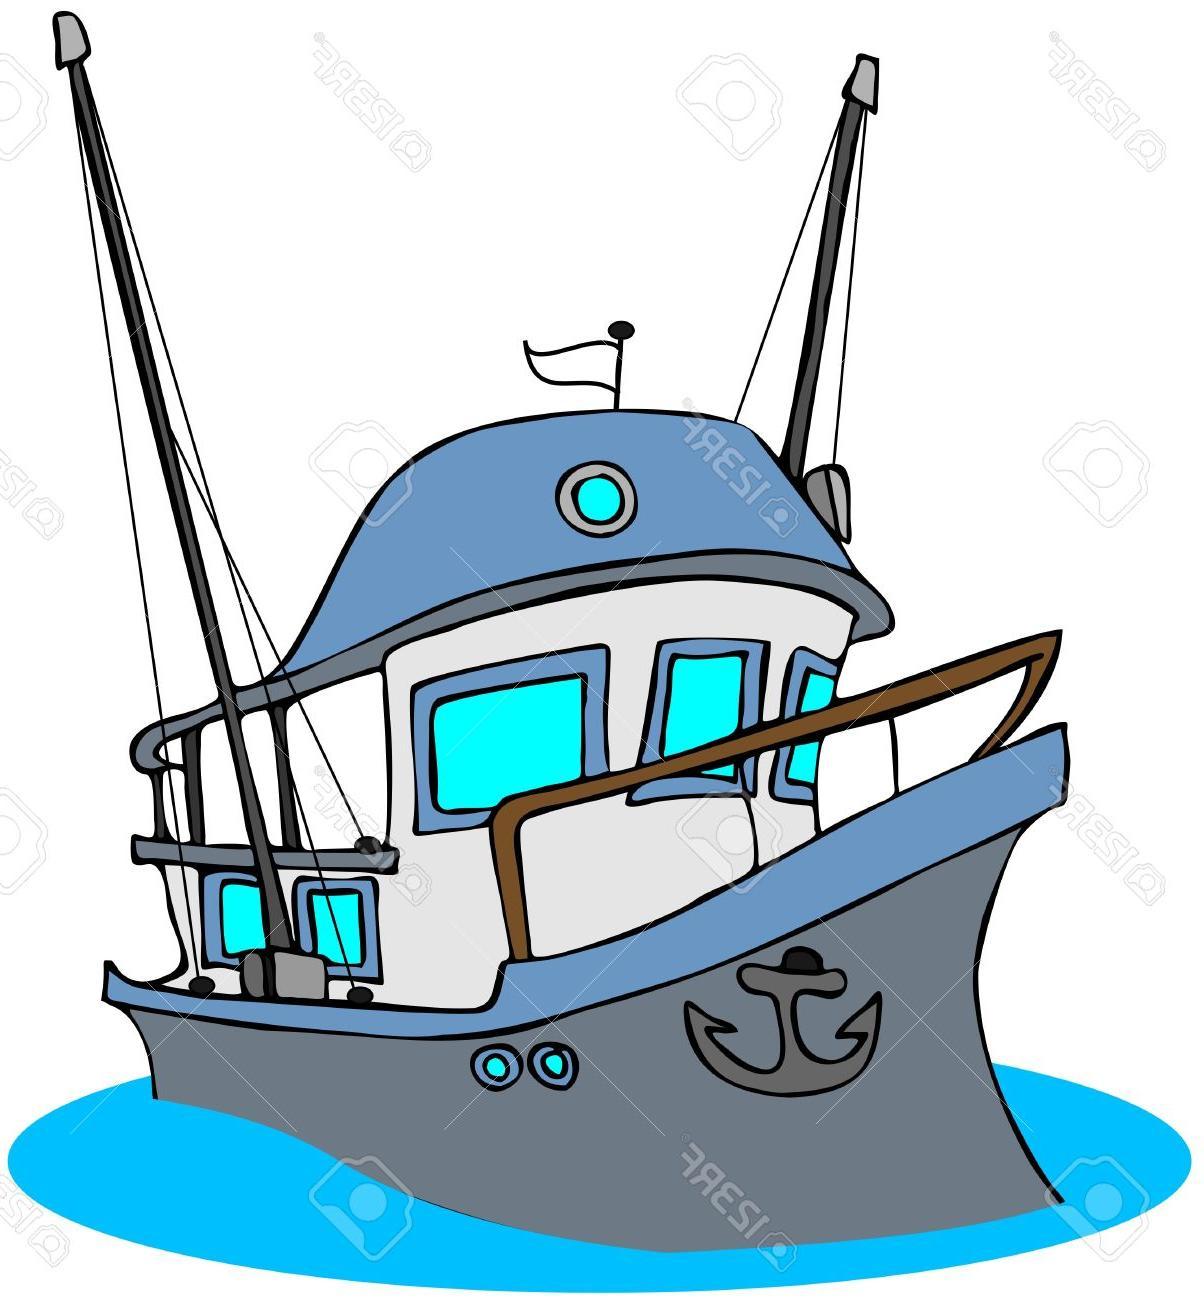 1204x1300 Top 10 Fishing Boat Clipart Cartoon Cdr